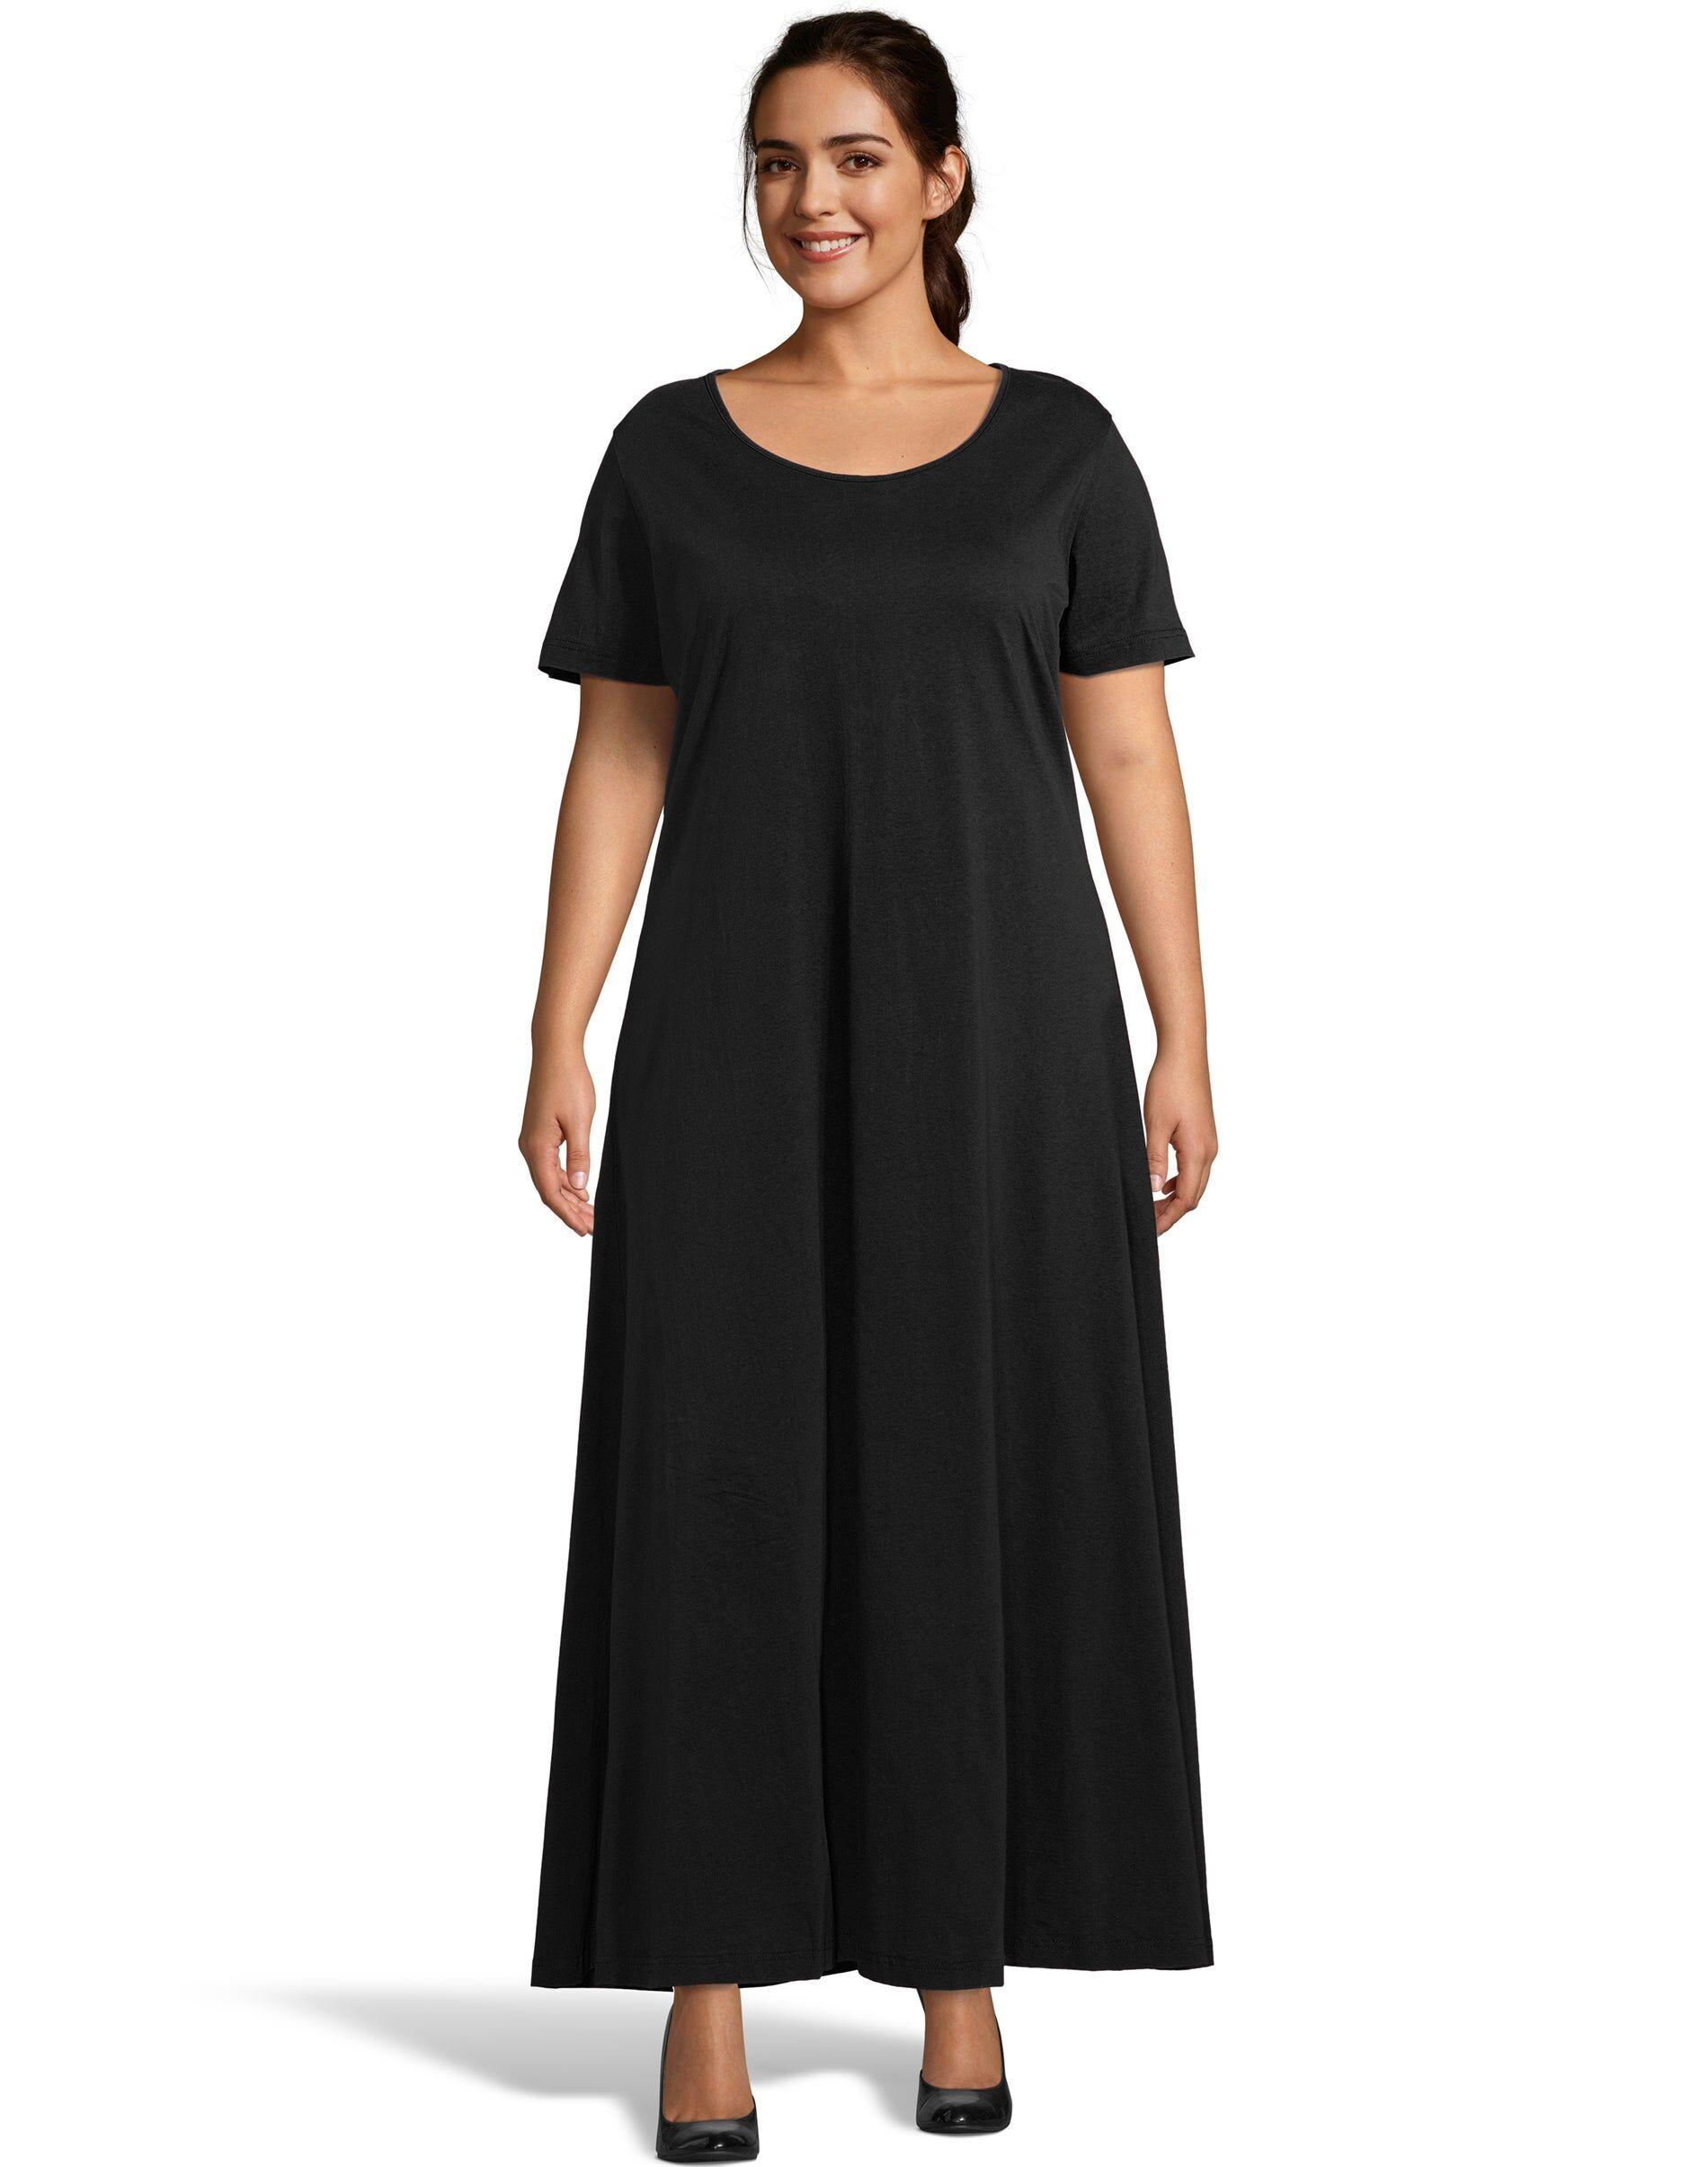 Just My Size Jersey Matchables Maxi Dress Black 4X Women's